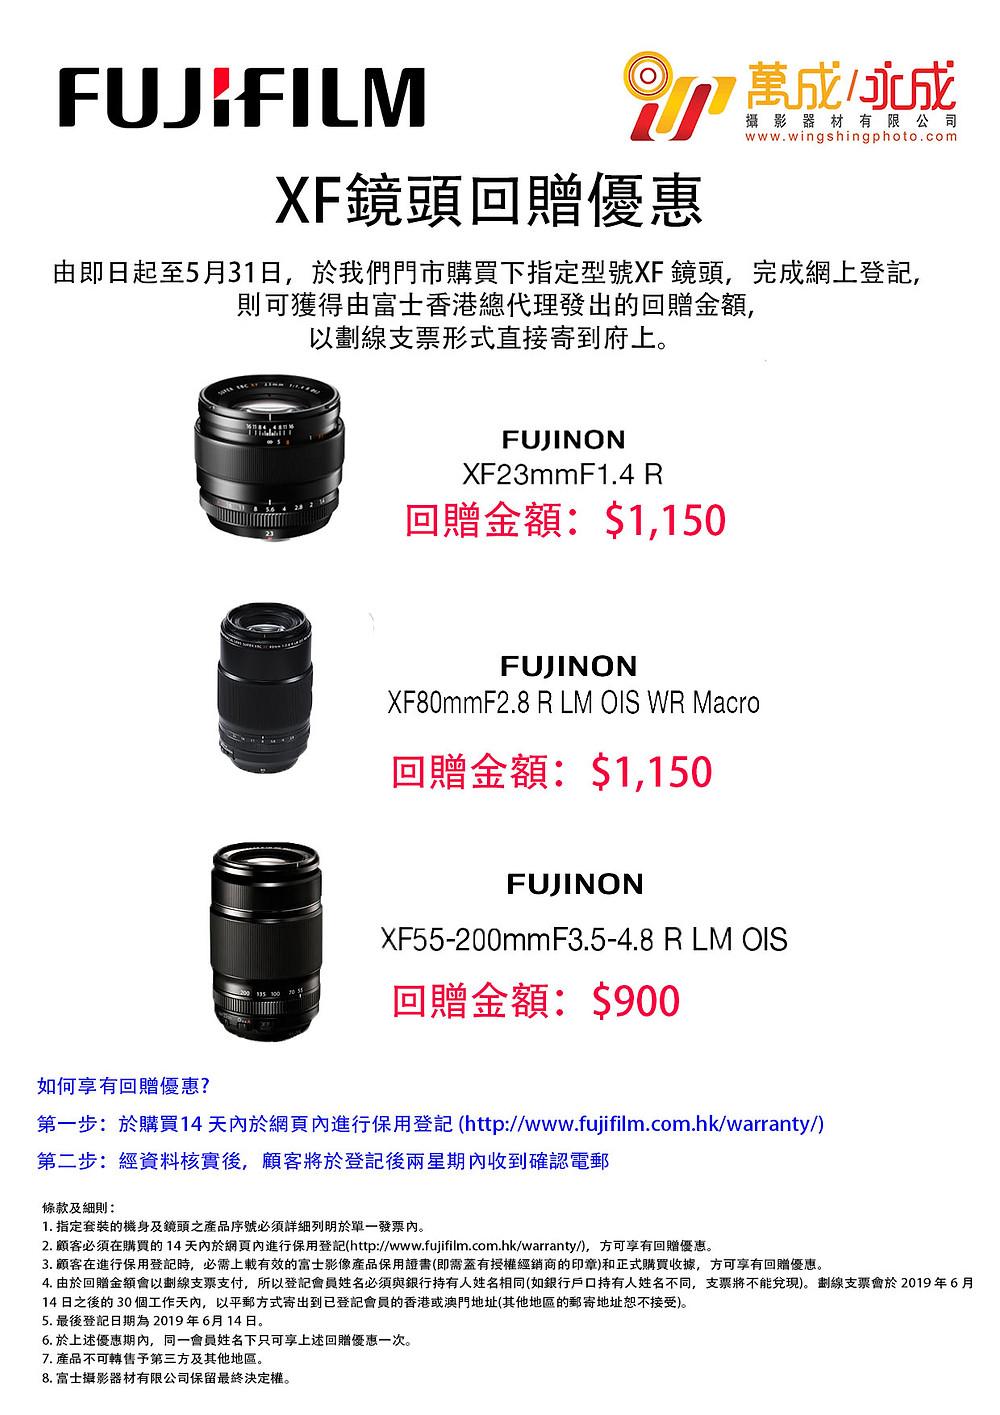 XF23mmF1.4 回贈$1,150/ XF80mmF2.8 回贈$1,150/ XF55-200mm回贈$900